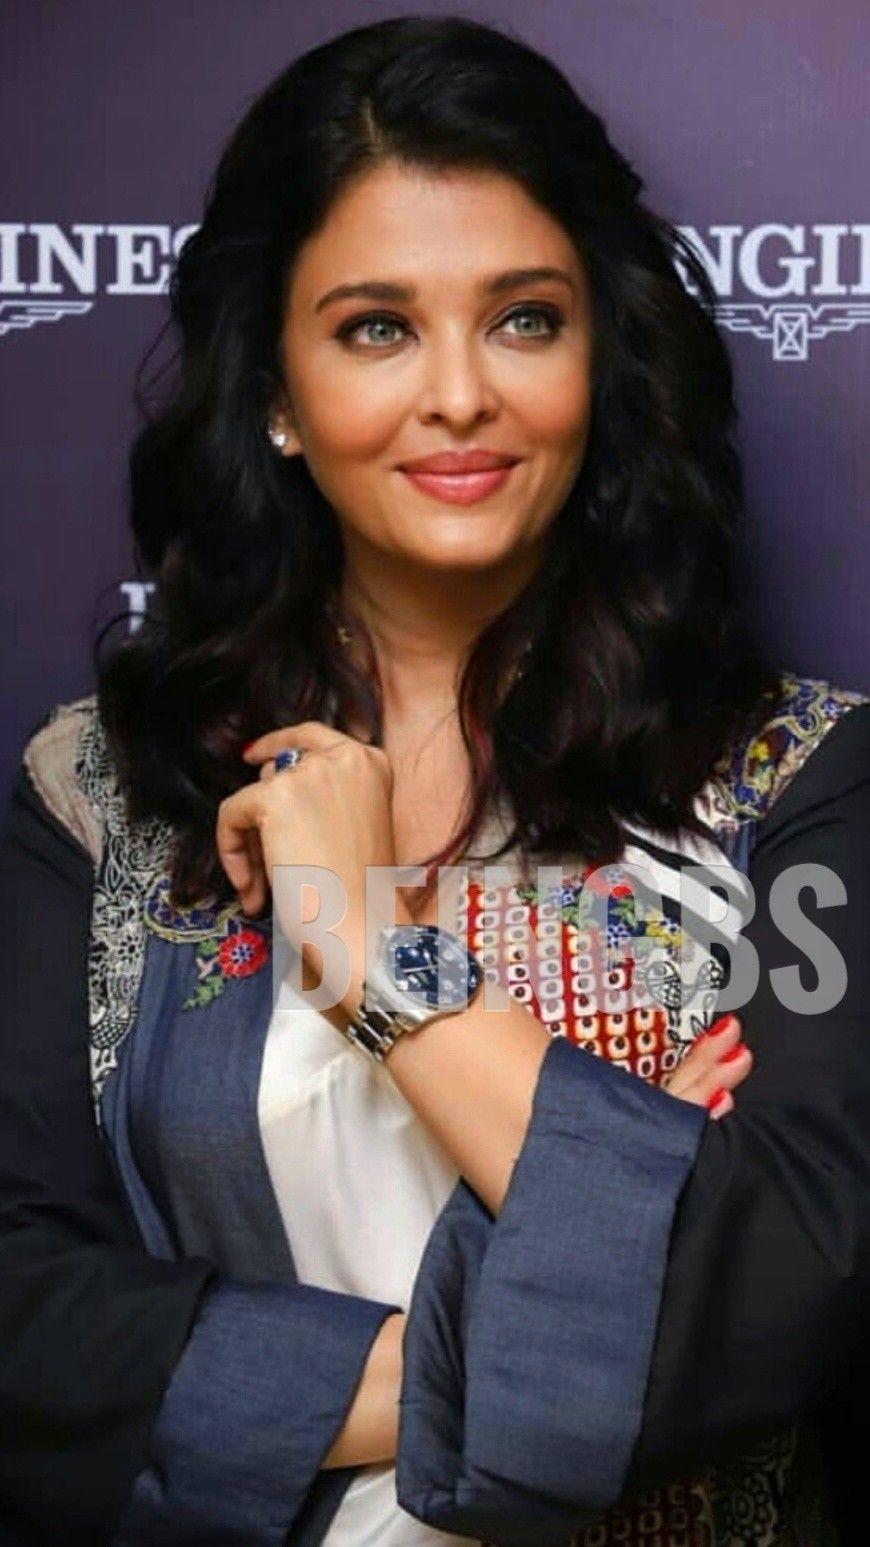 Aish Aishwarya Rai Photo Aishwarya Rai Young Actress Aishwarya Rai